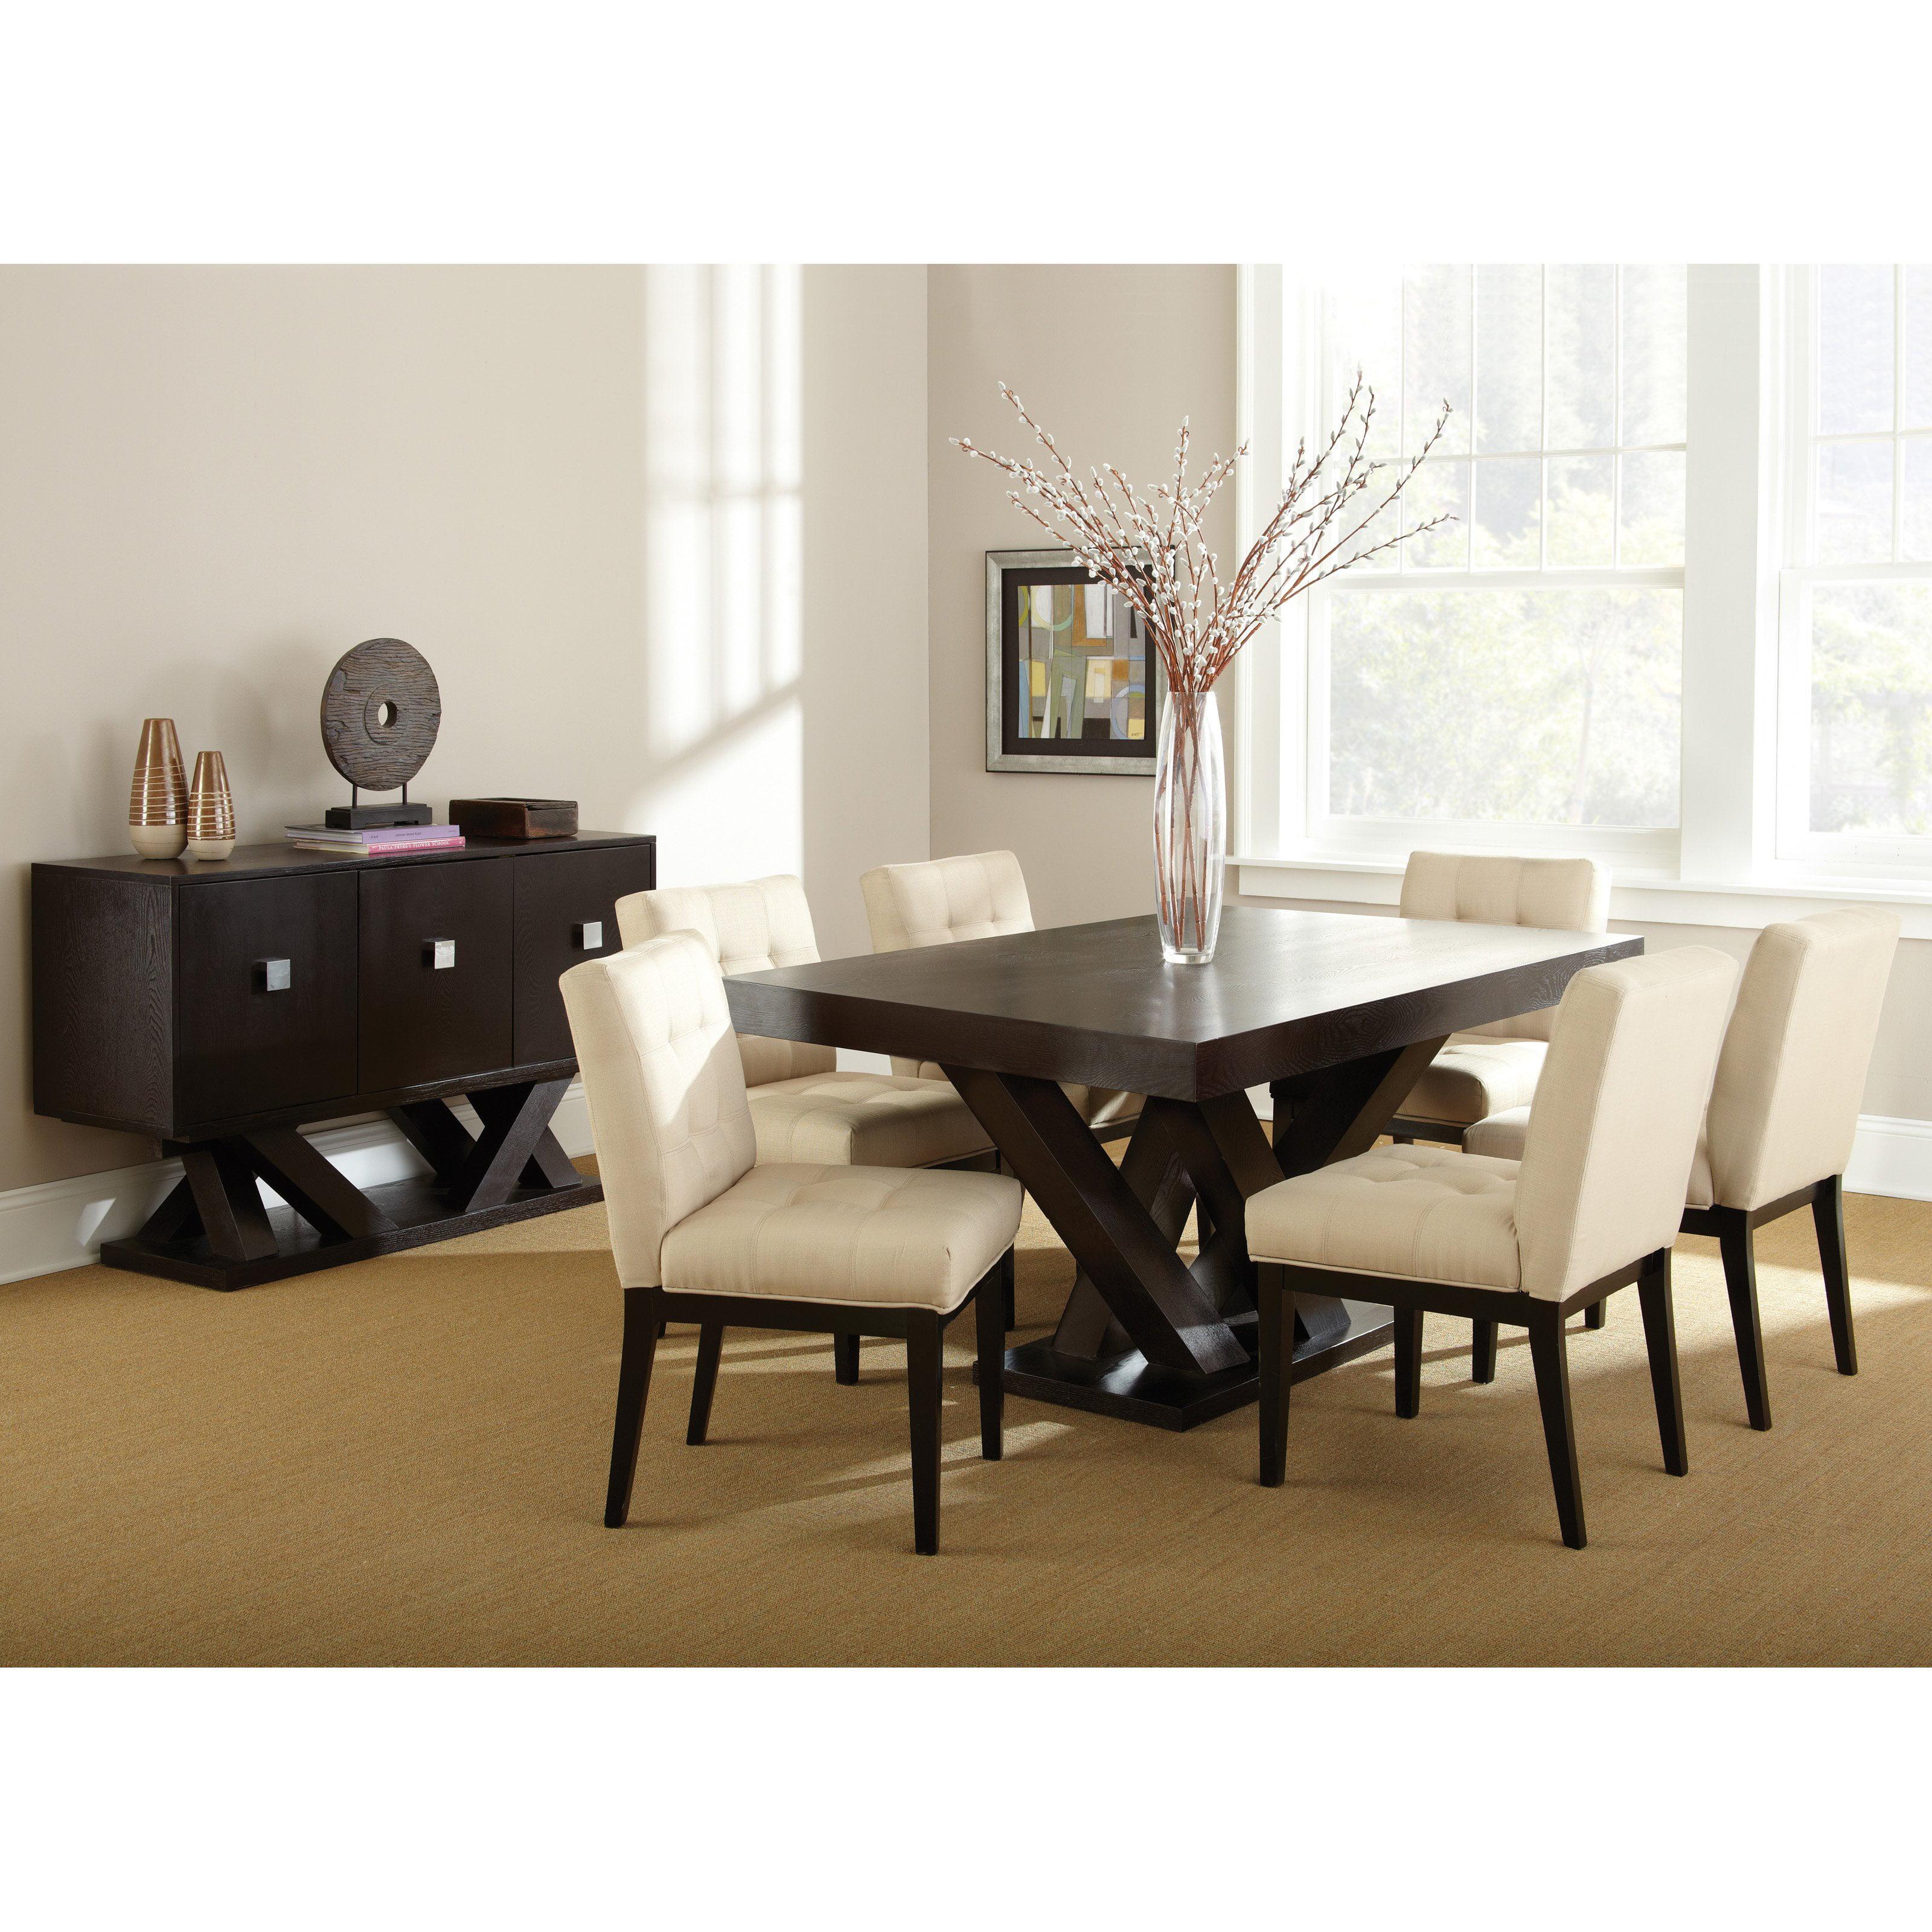 Steve Silver Tiffany Dining Chairs   Espresso / Beige   Set Of 2    Walmart.com